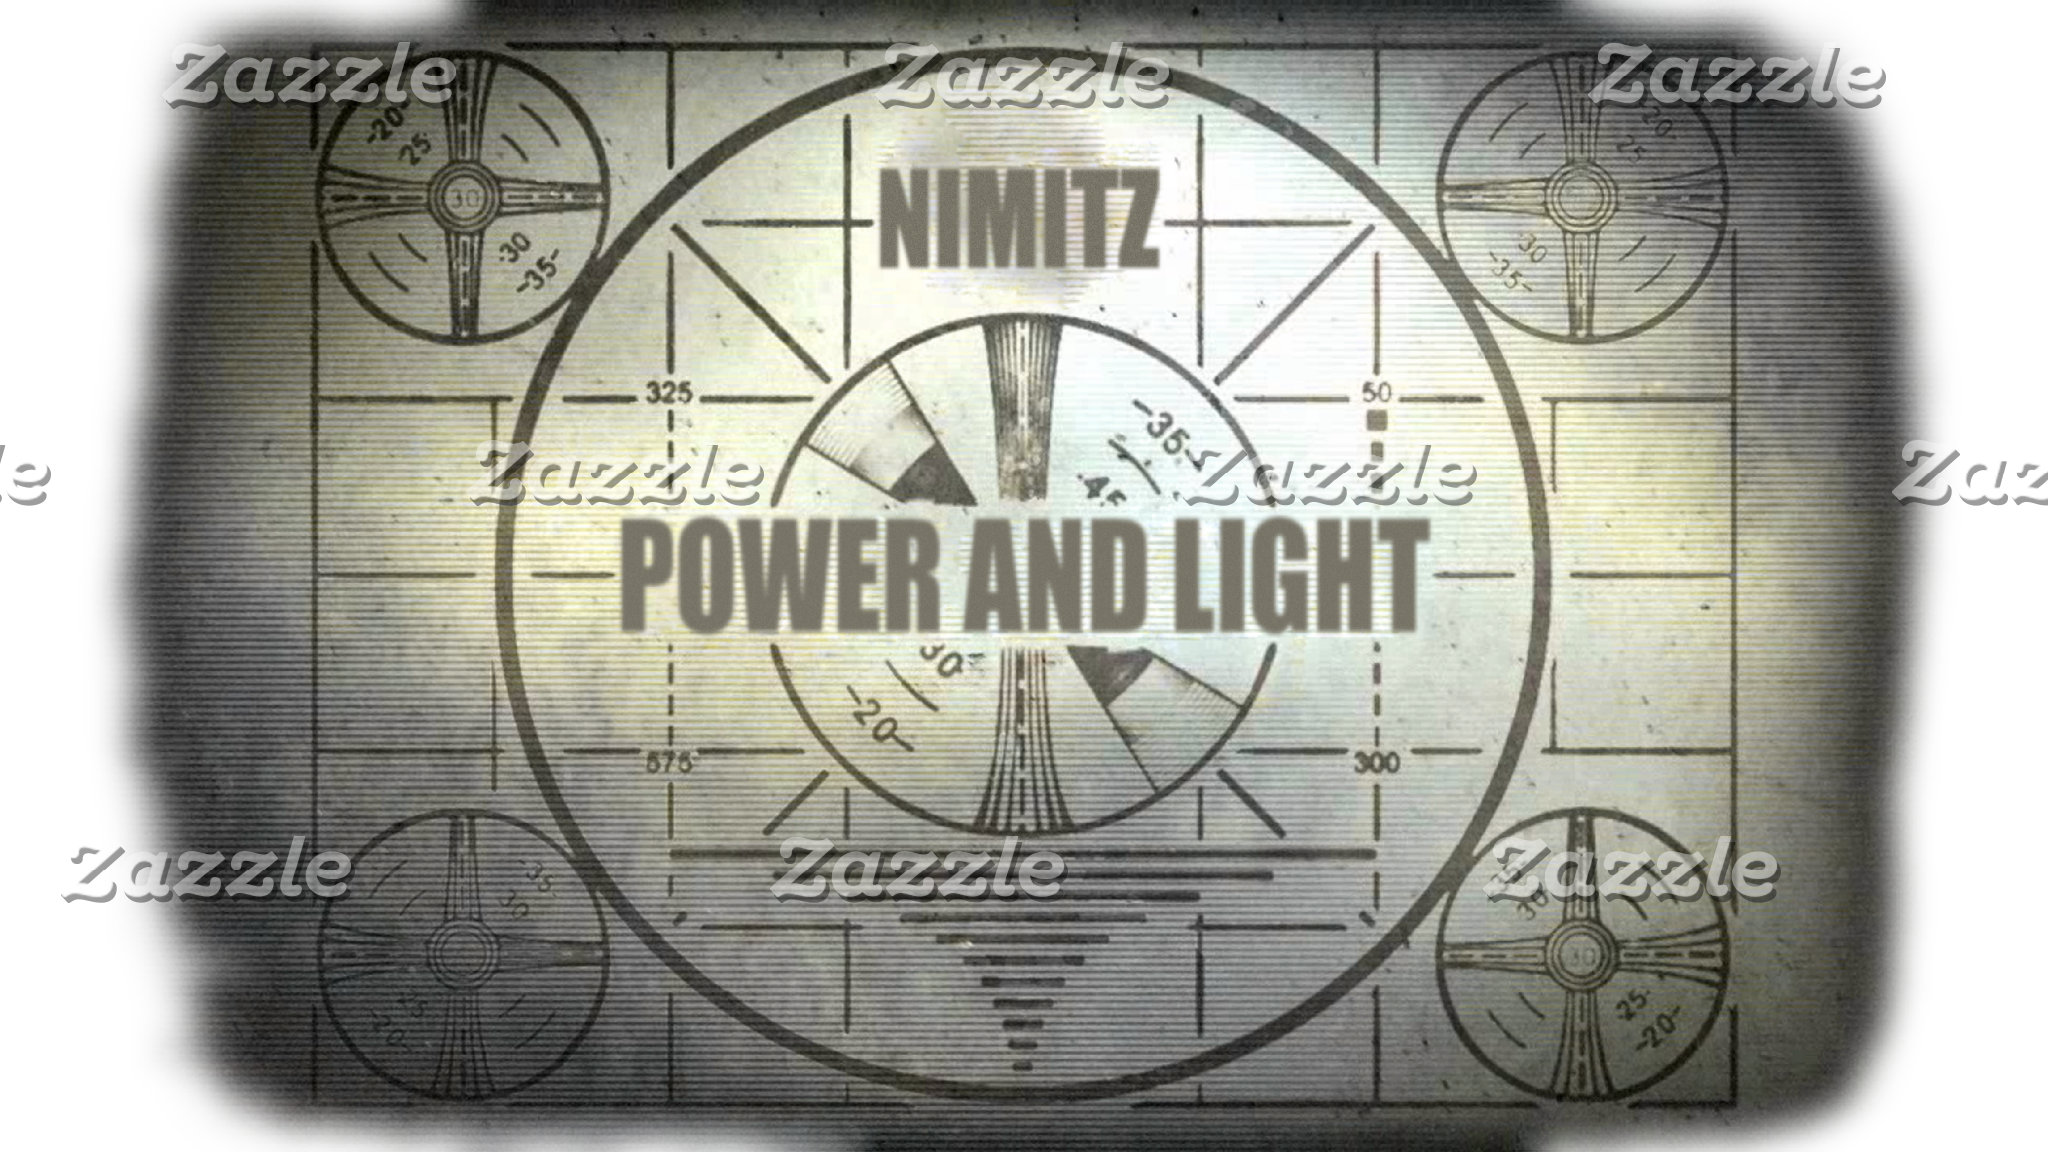 Nimitz Power and Light